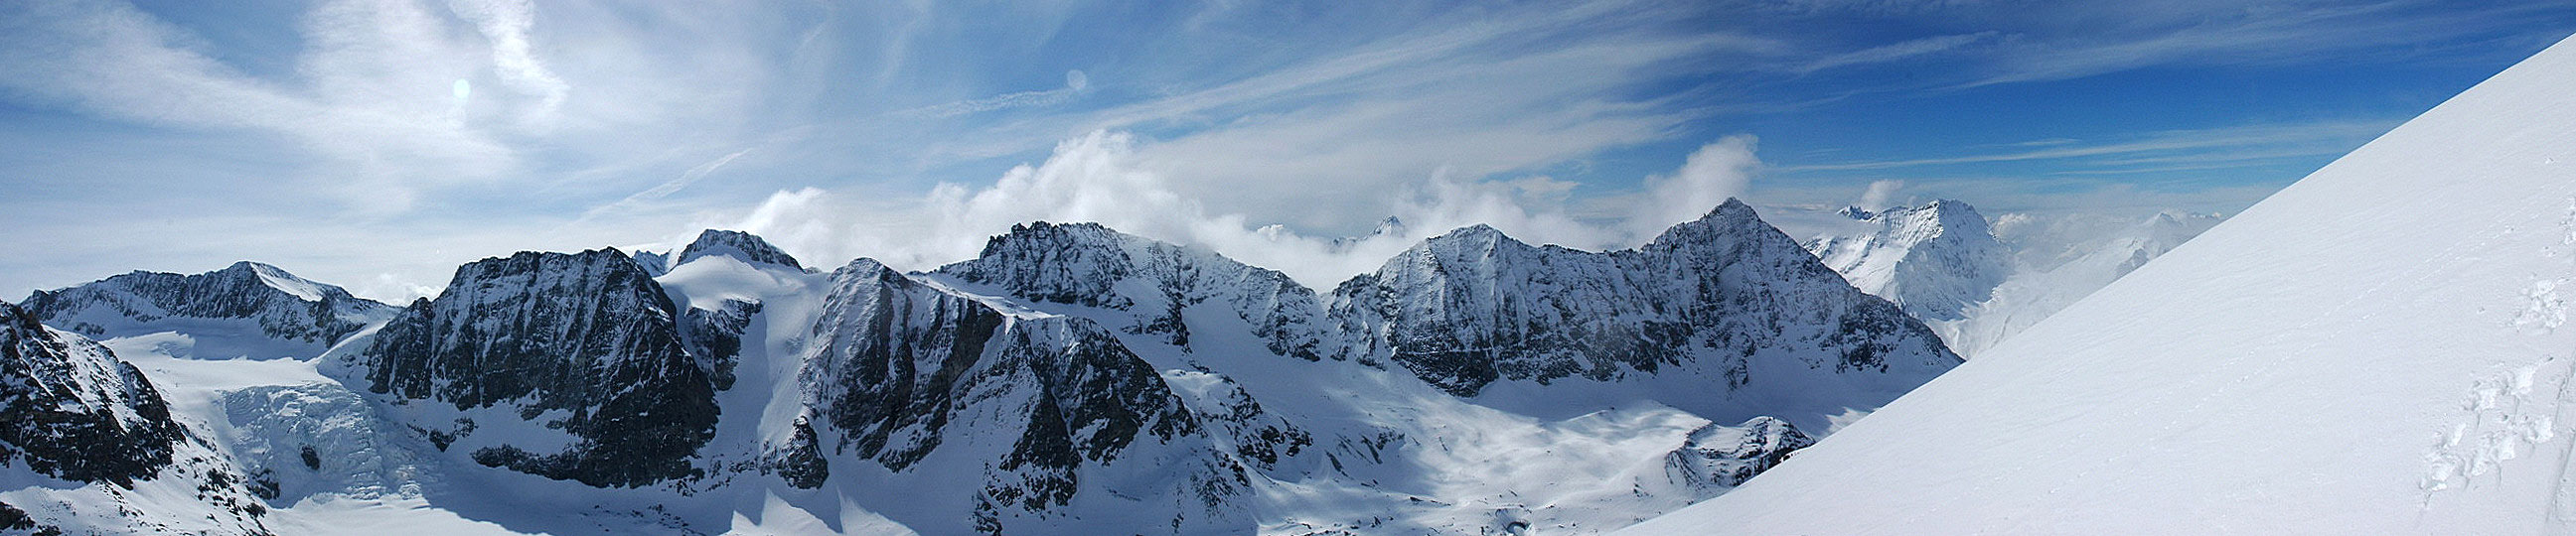 La Ruinette Walliser Alpen / Alpes valaisannes Švýcarsko panorama 34